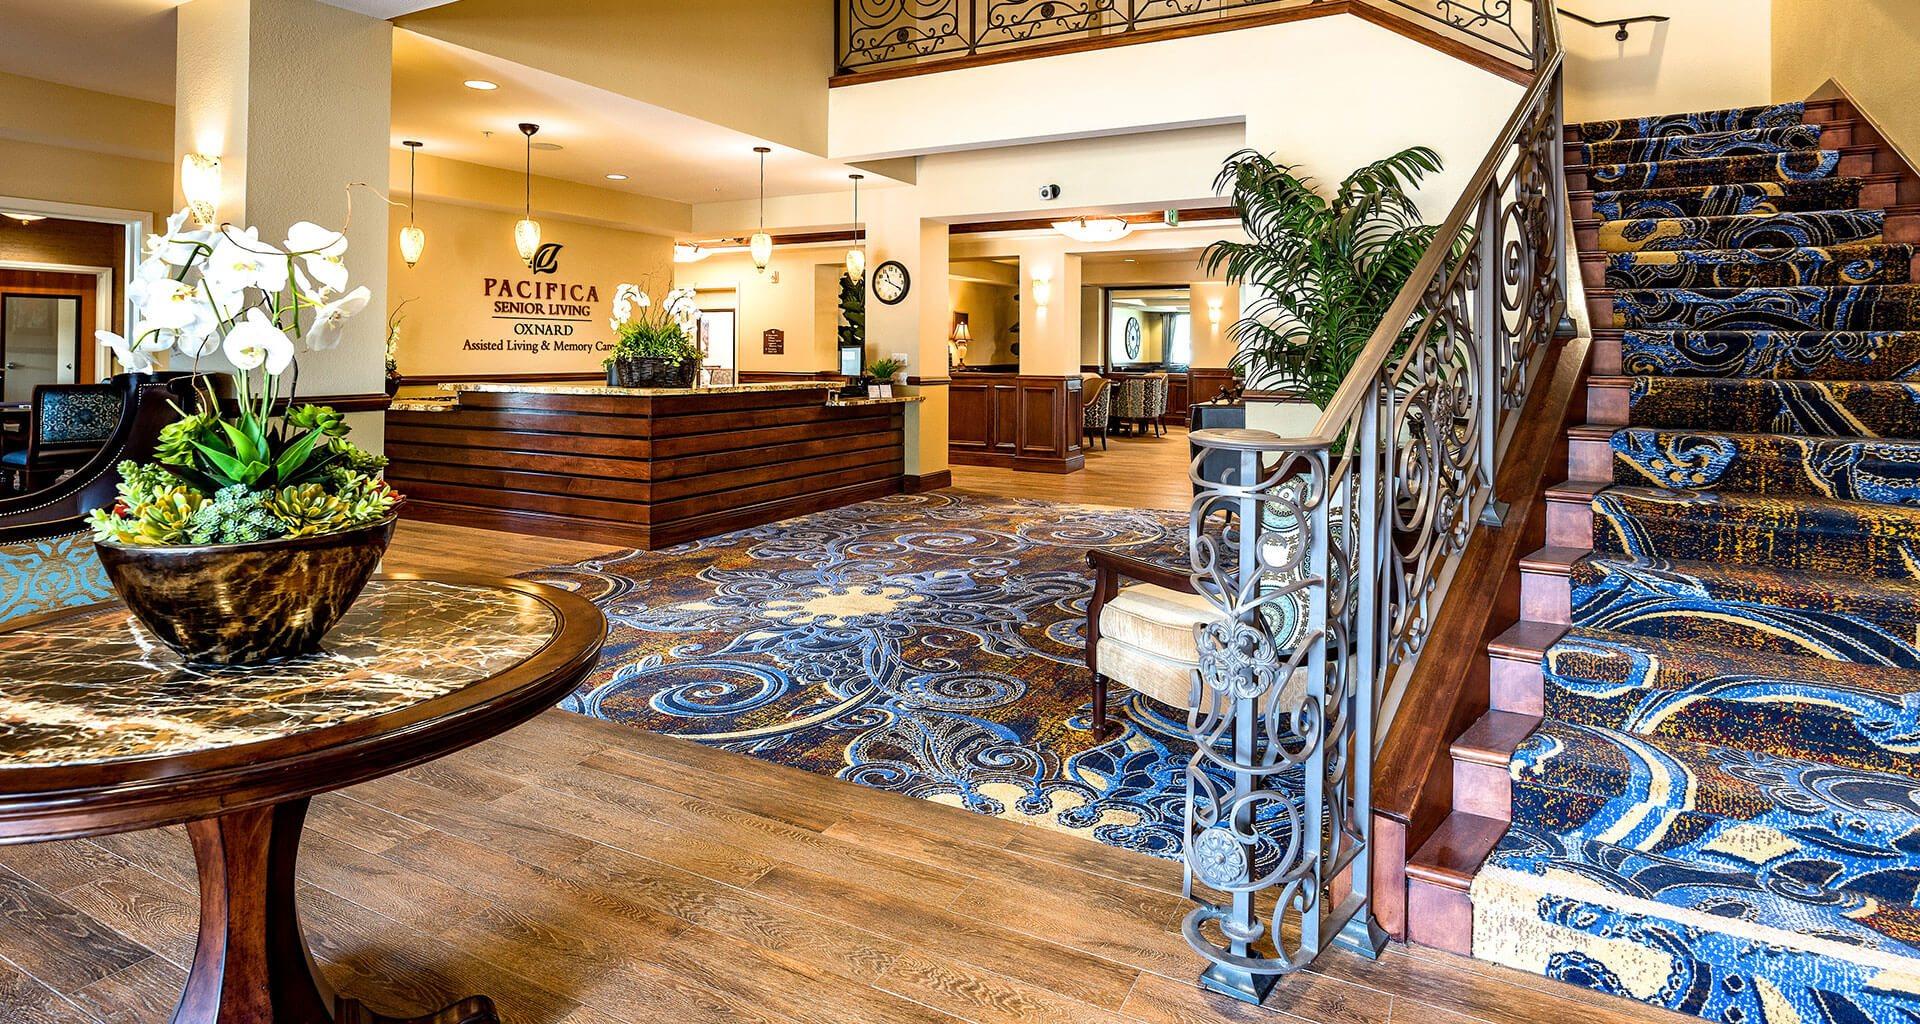 Decorated Reception And Lobby Area at Pacifica Senior Living Oxnard, Oxnard, 93036